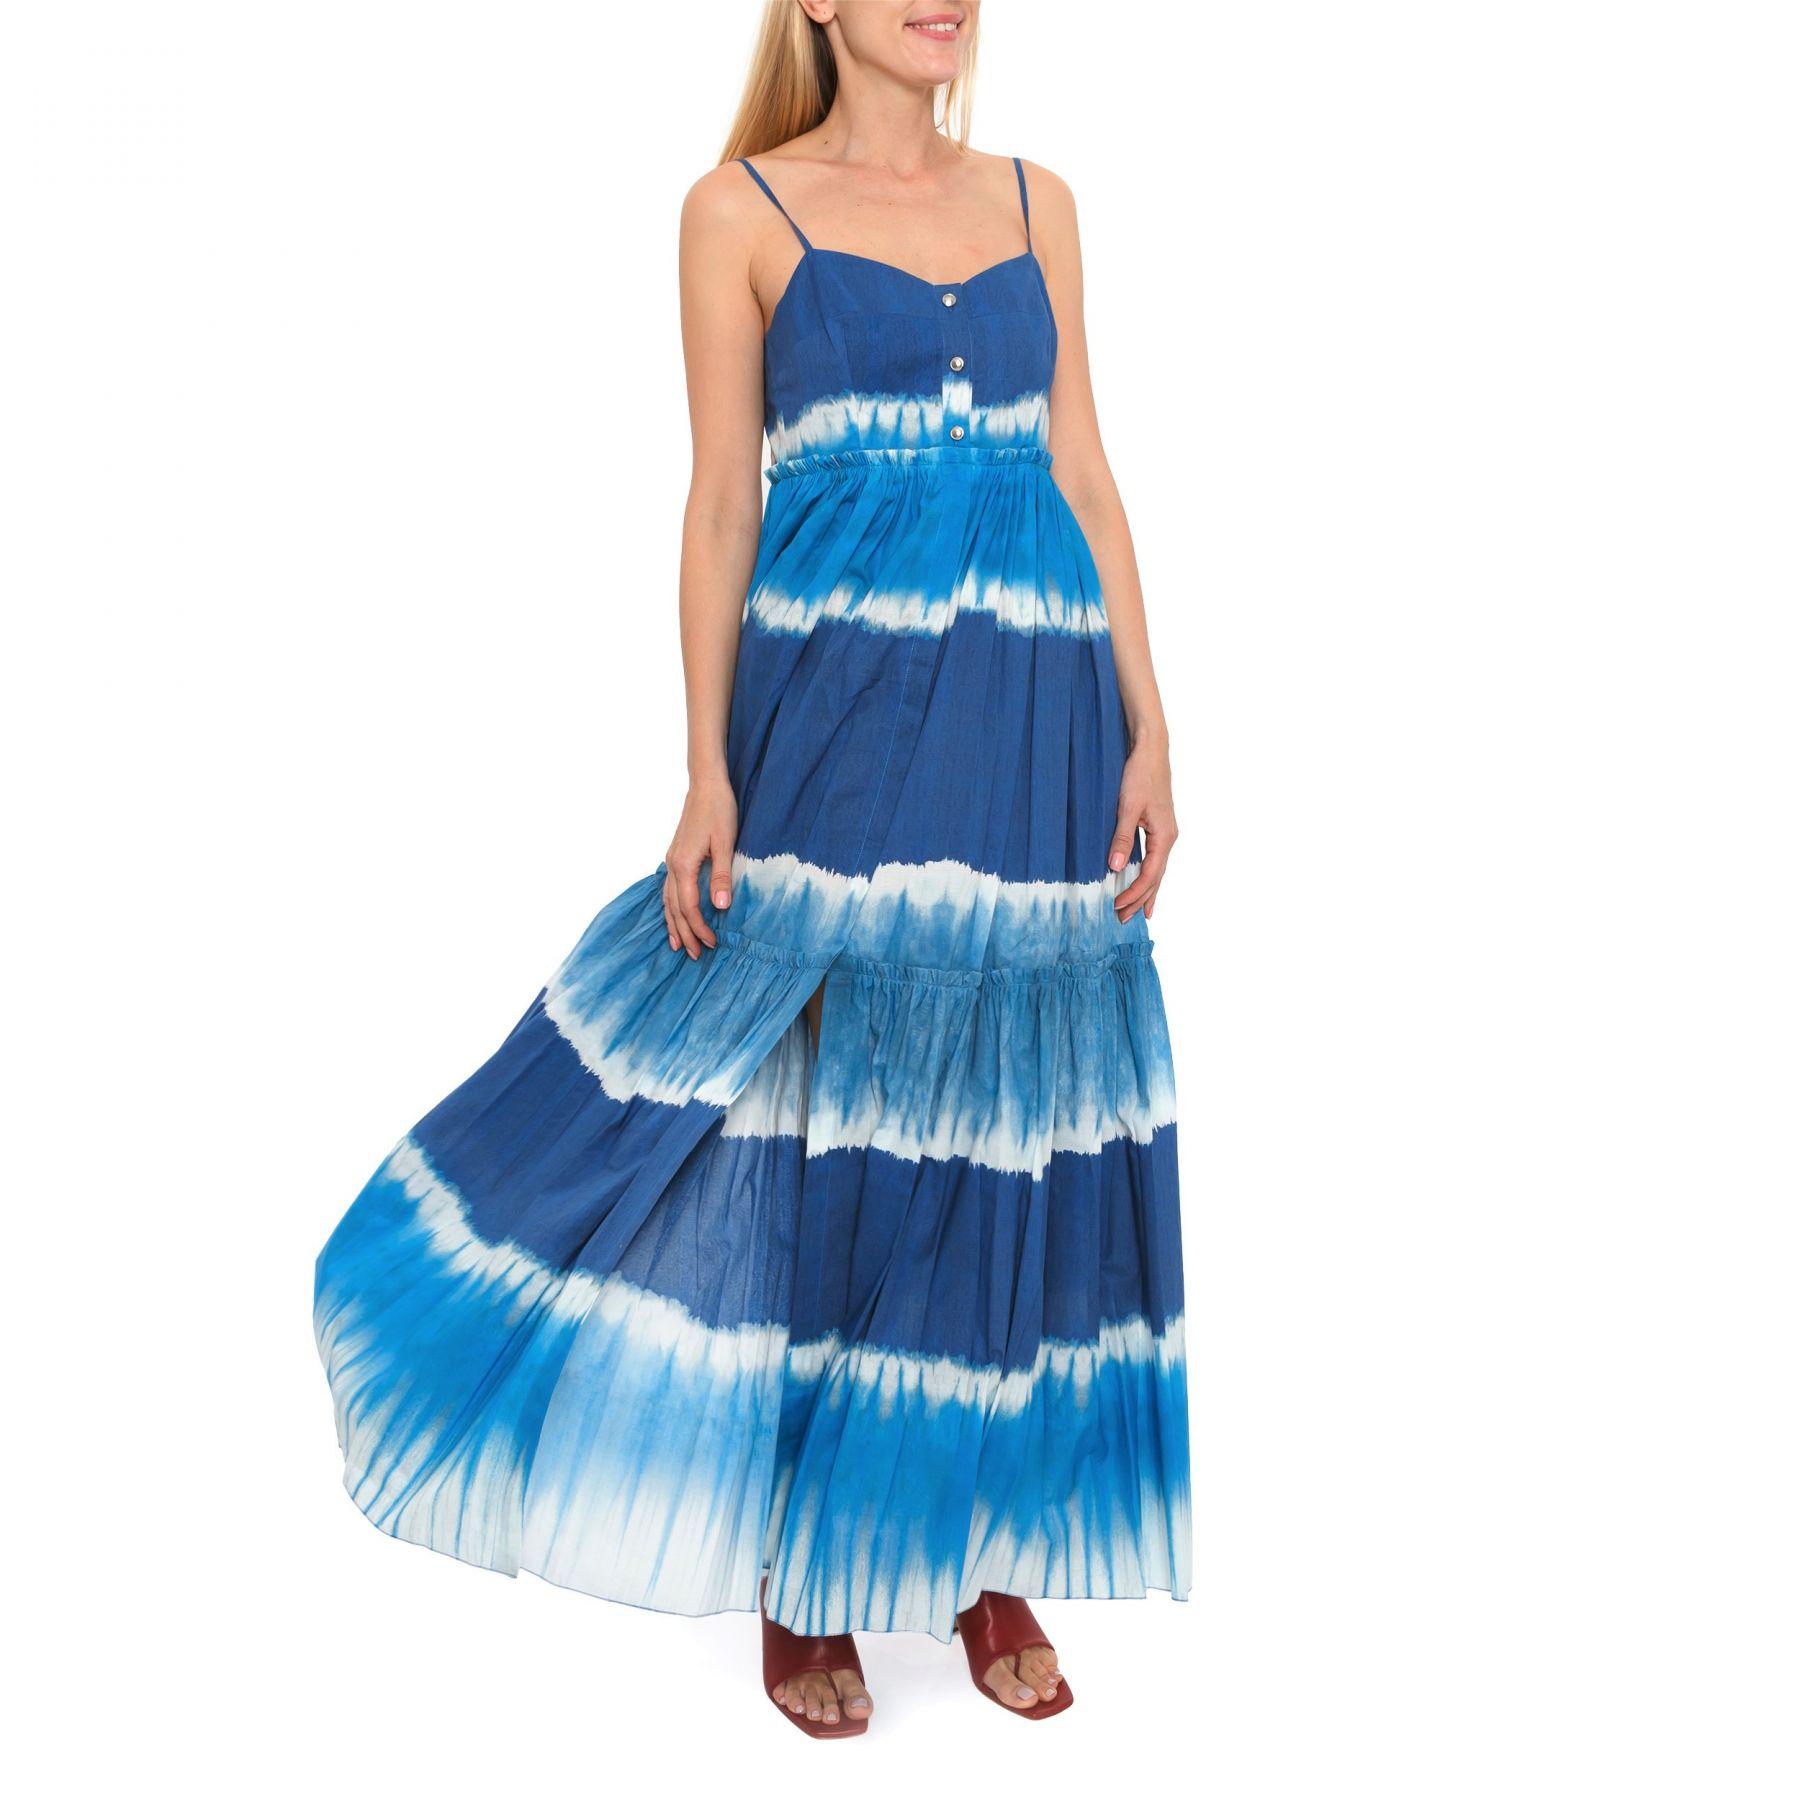 Сарафан Alberta Ferretti сине-голубой